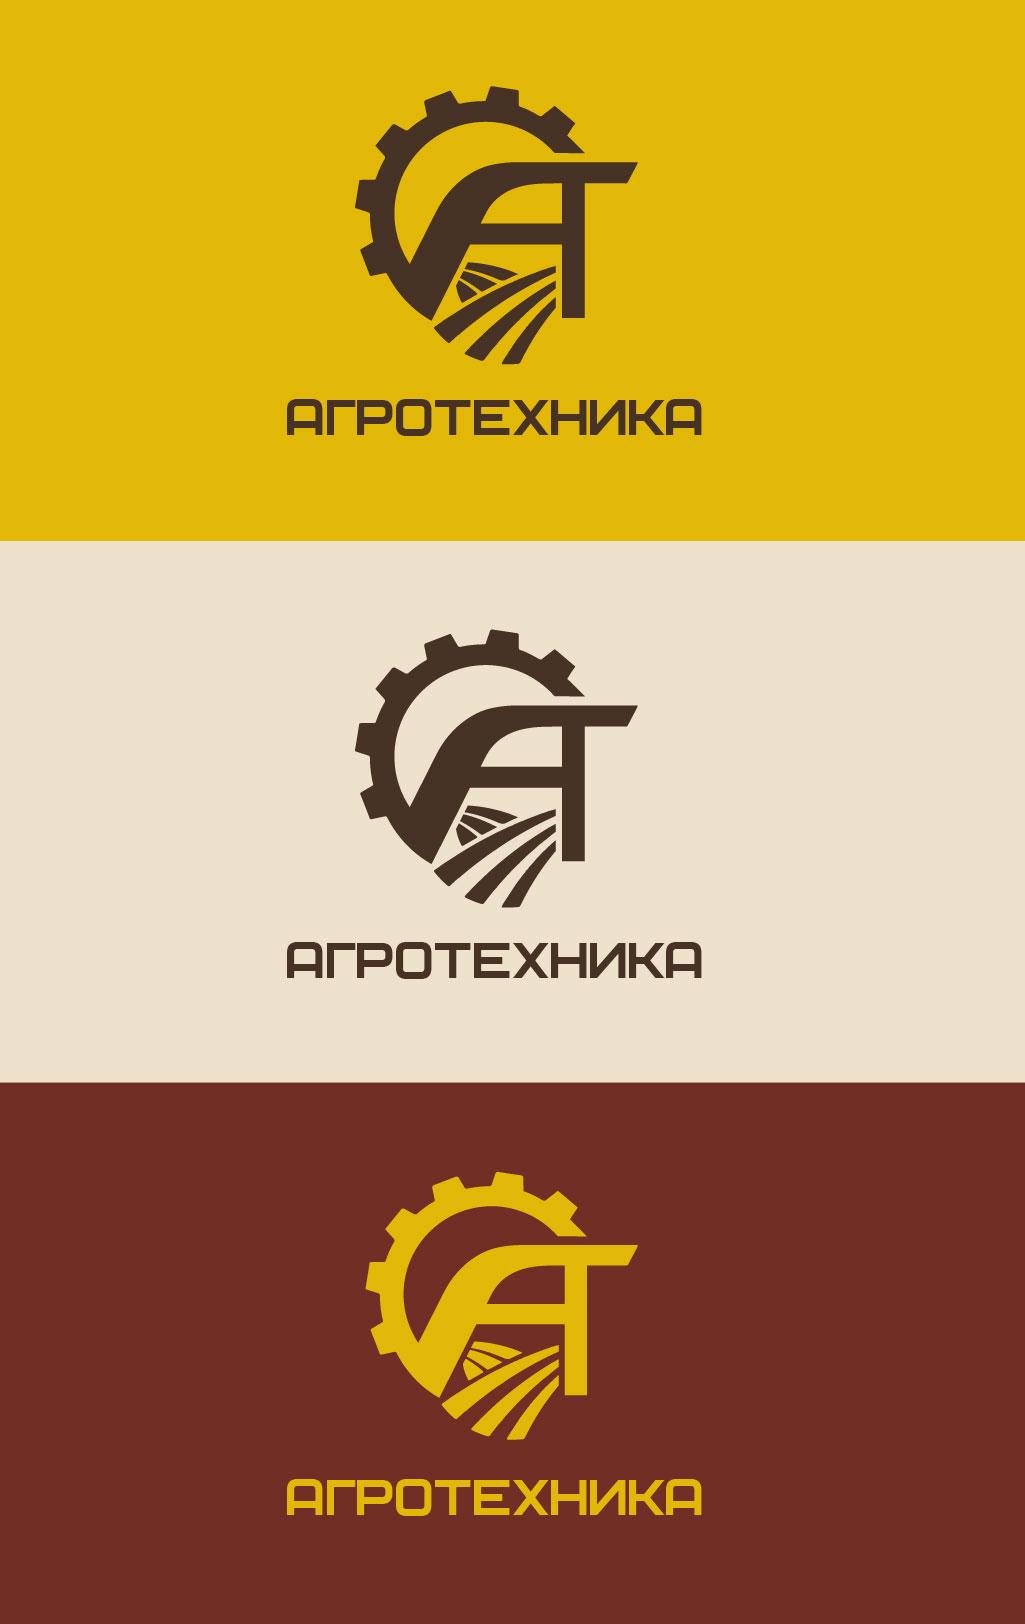 Разработка логотипа для компании Агротехника фото f_4975c008d162ed98.jpg